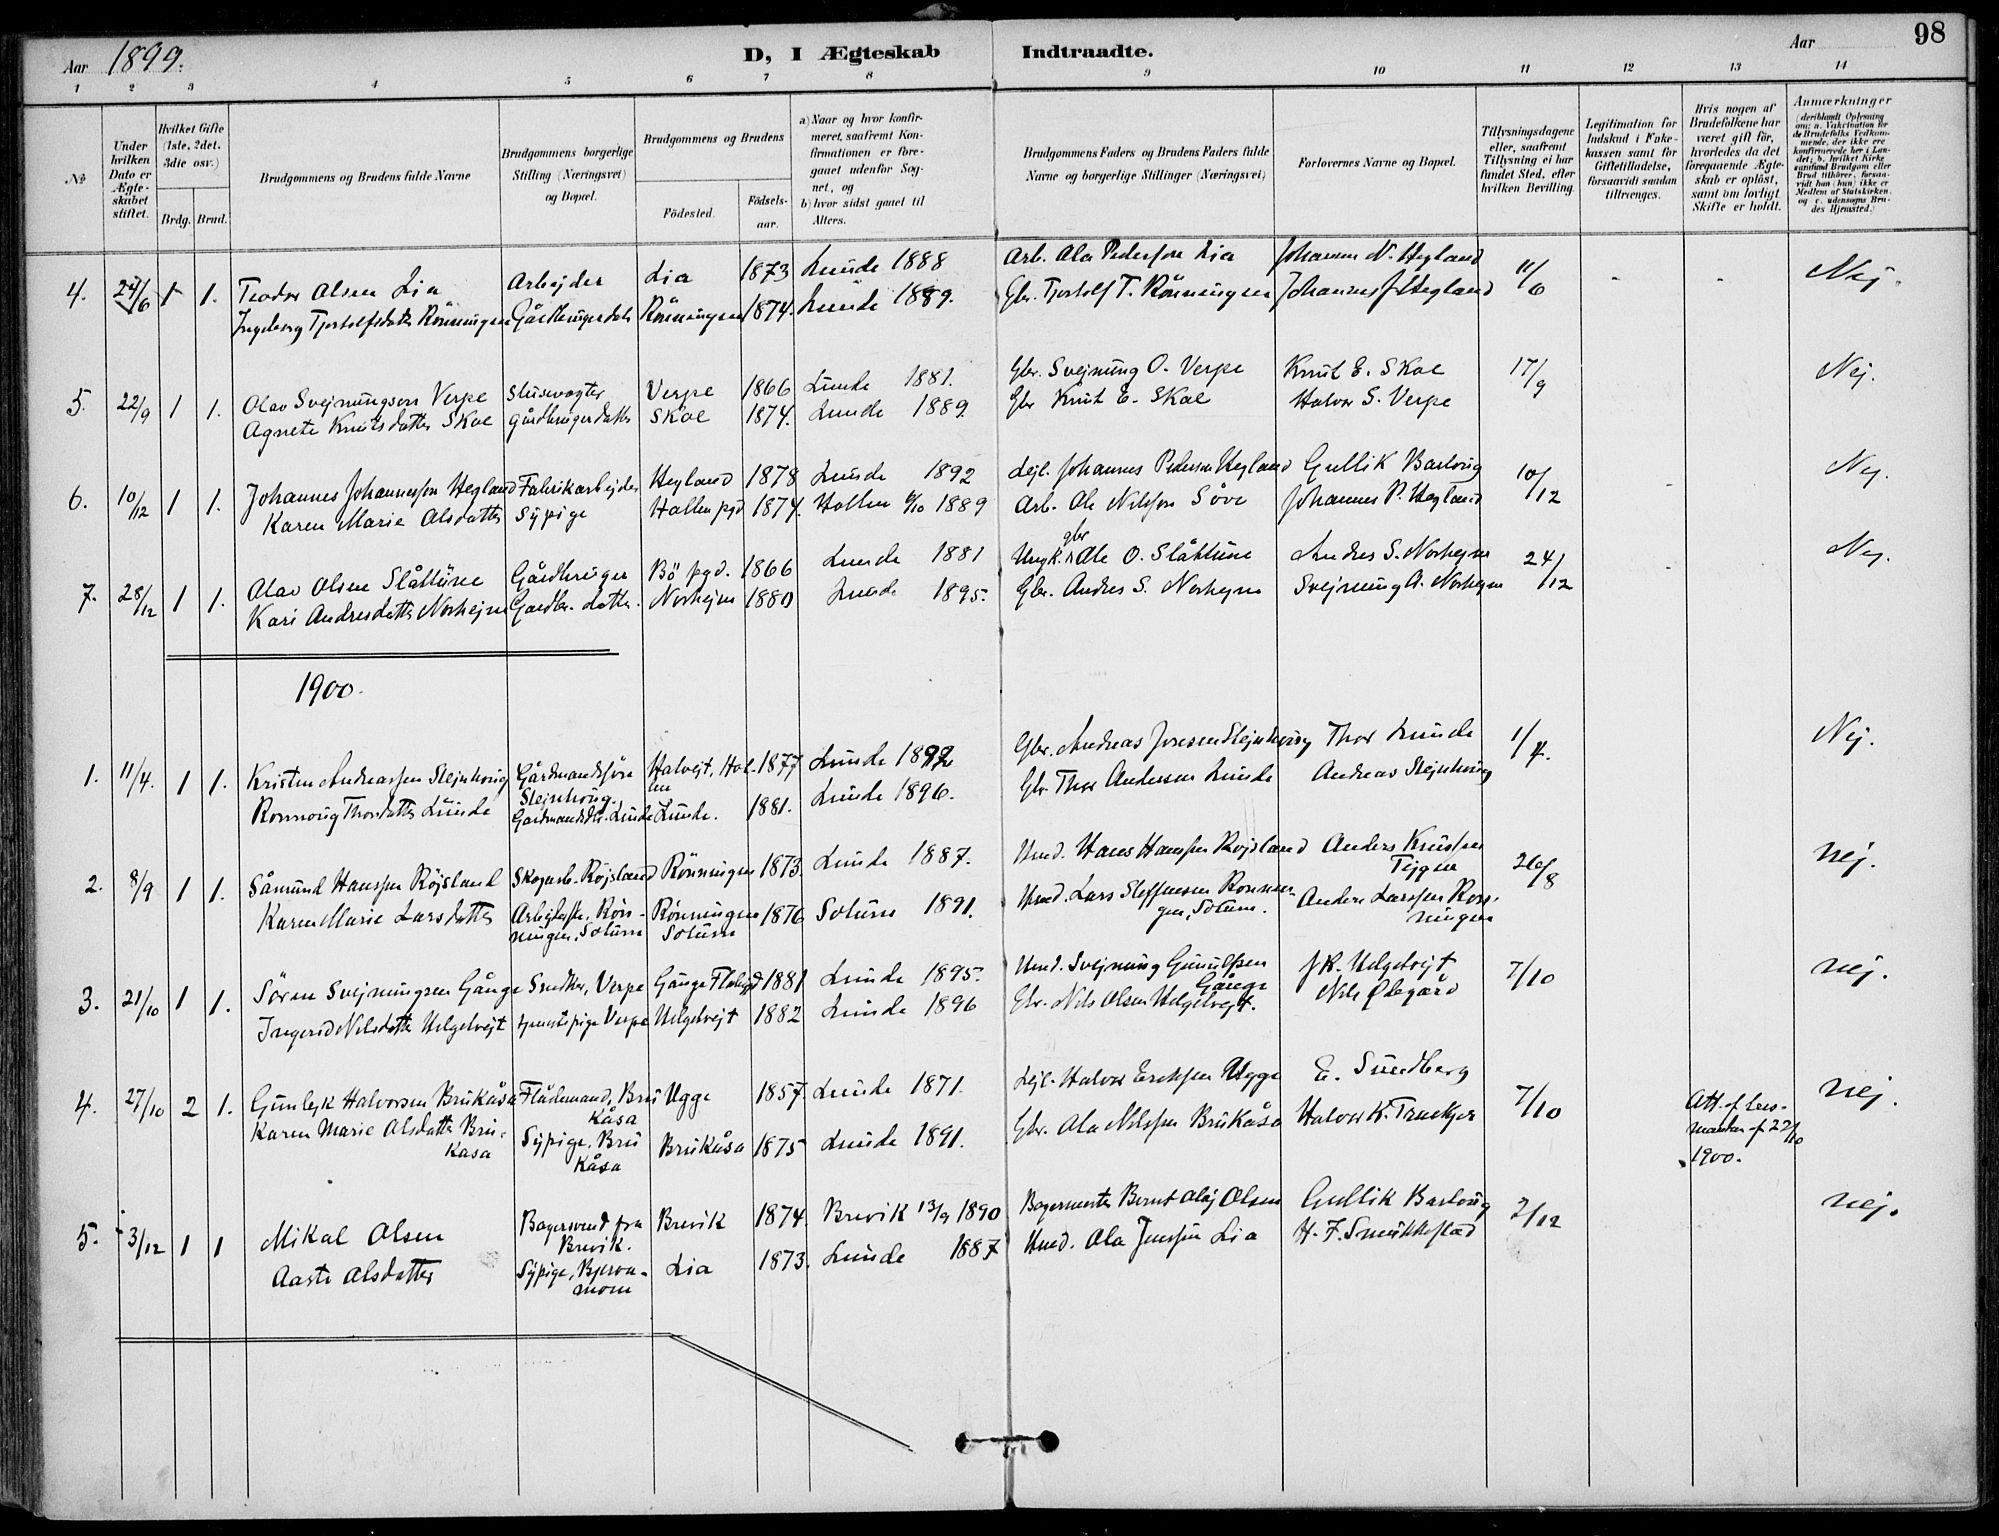 SAKO, Lunde kirkebøker, F/Fa/L0003: Ministerialbok nr. I 3, 1893-1902, s. 98